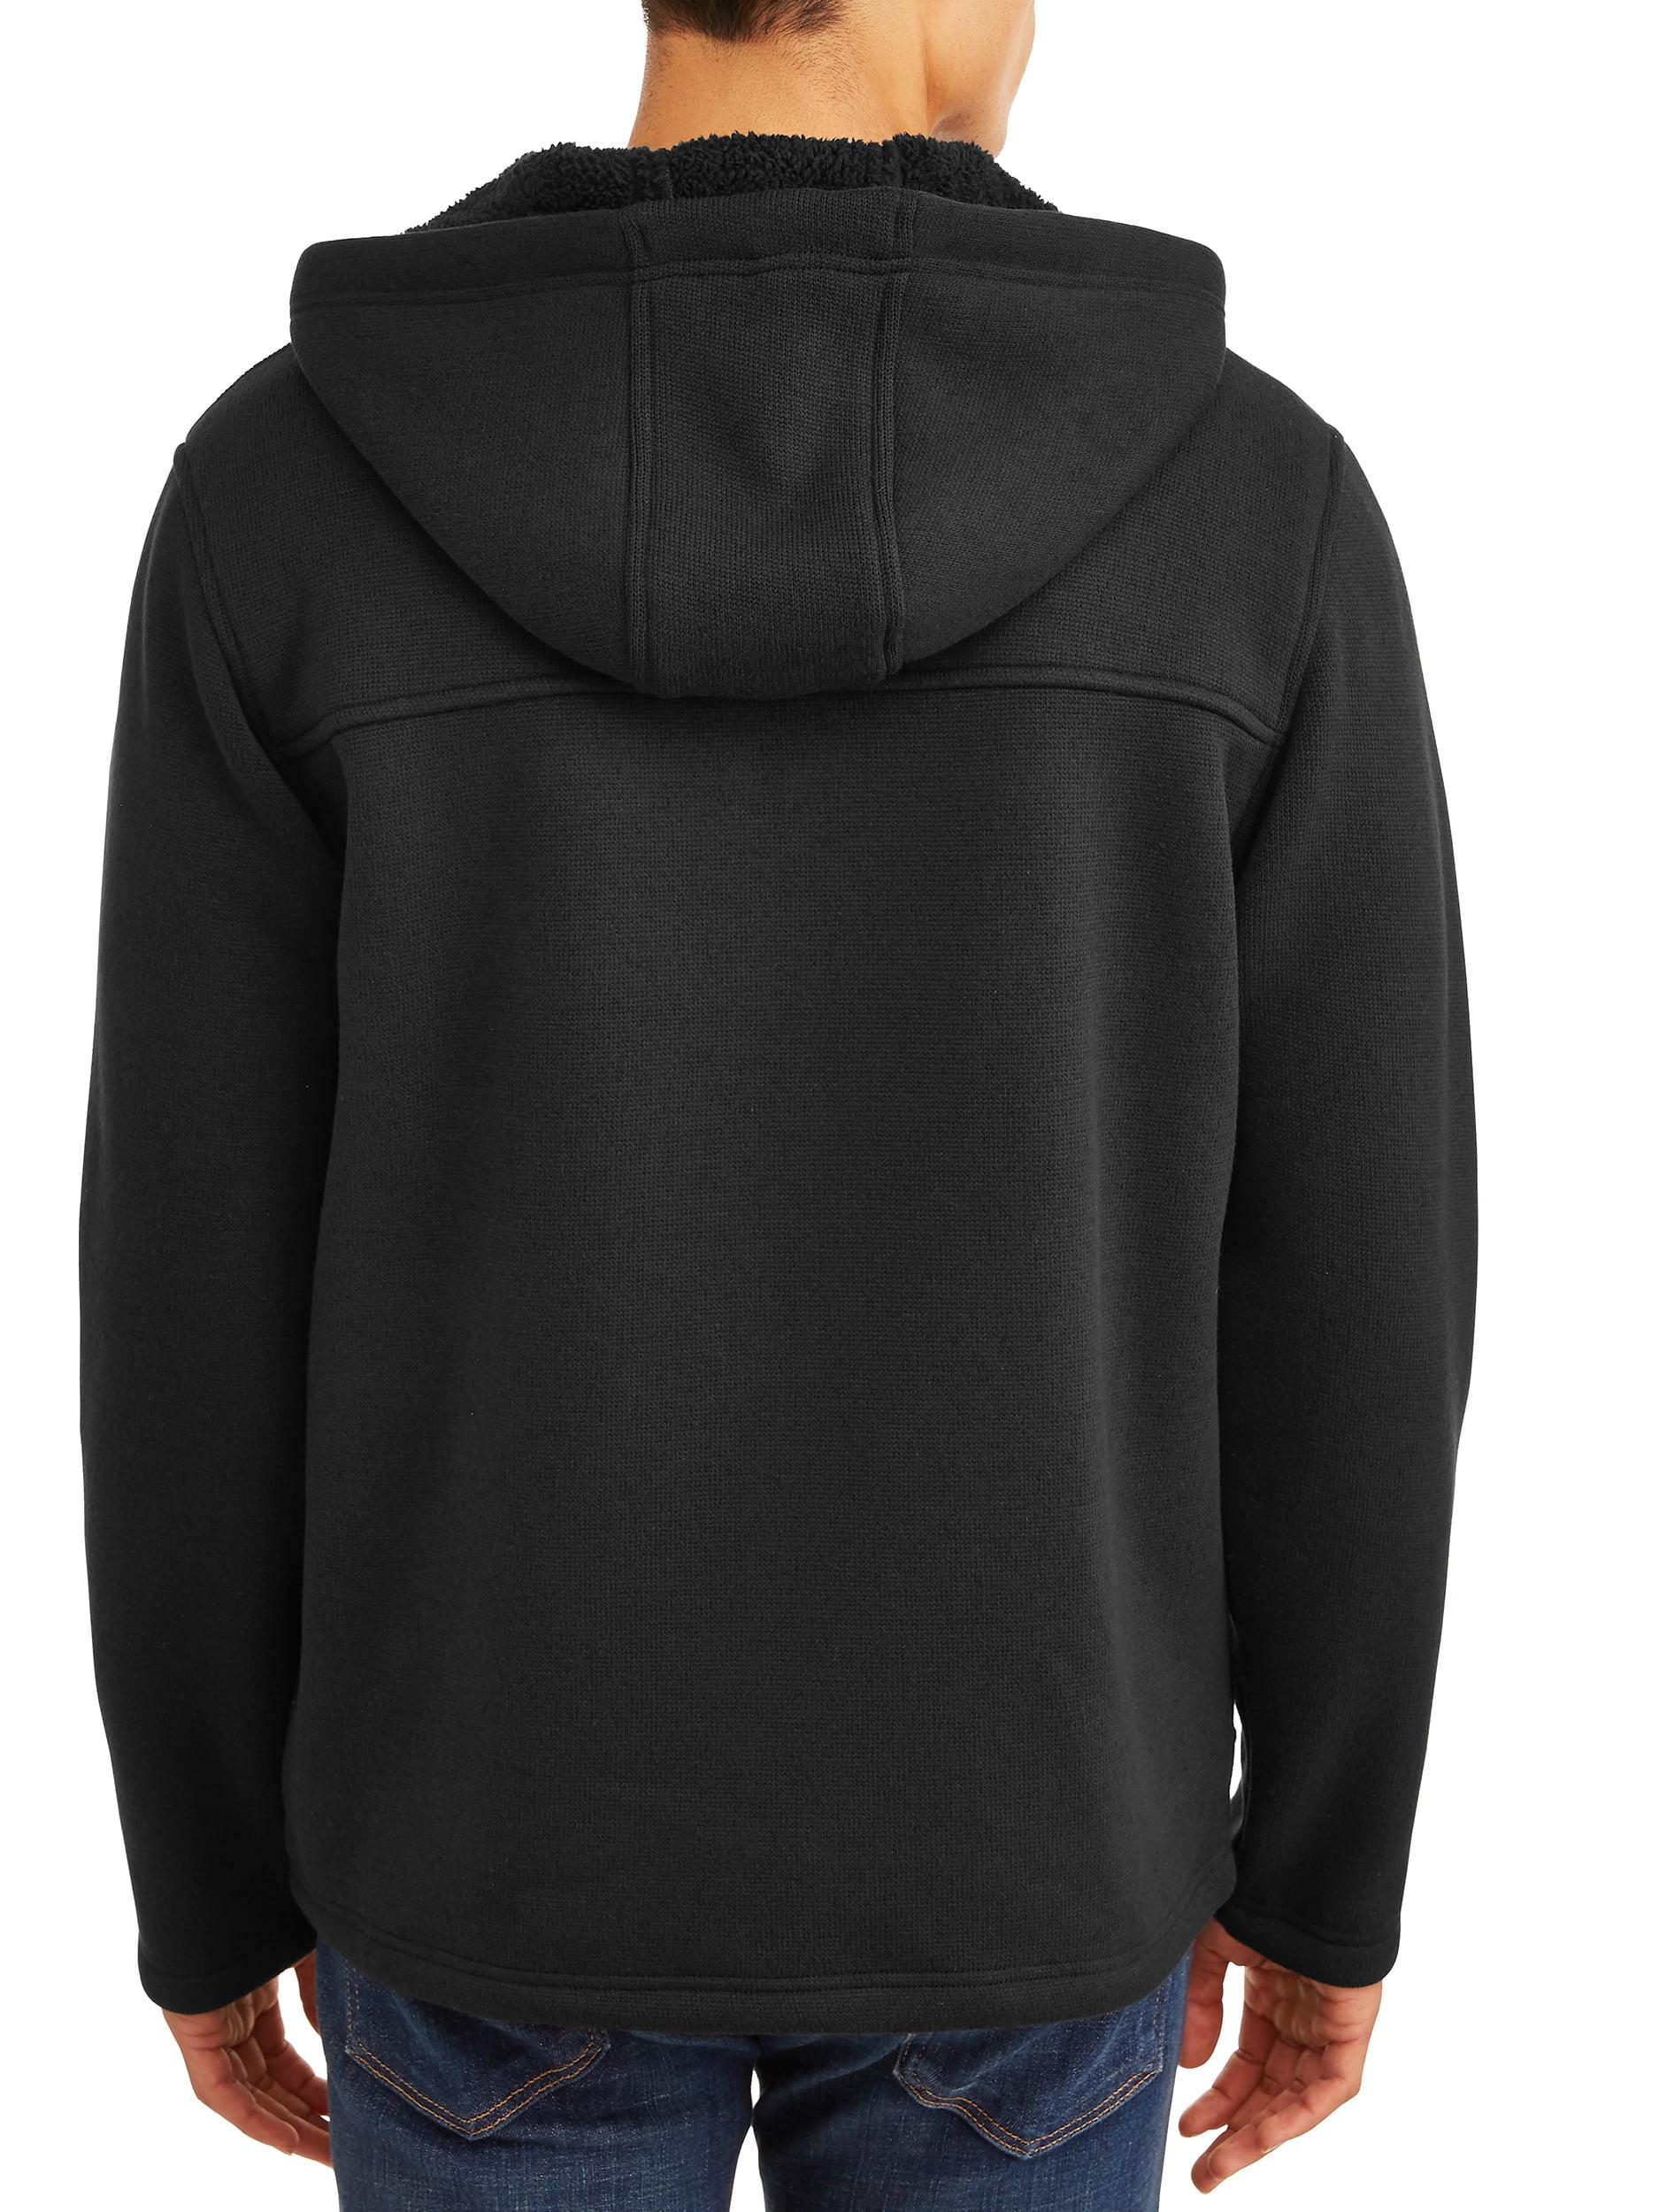 Got Ink Men/'s Hoodie Sweat Shirt Pick Size Small-5XL